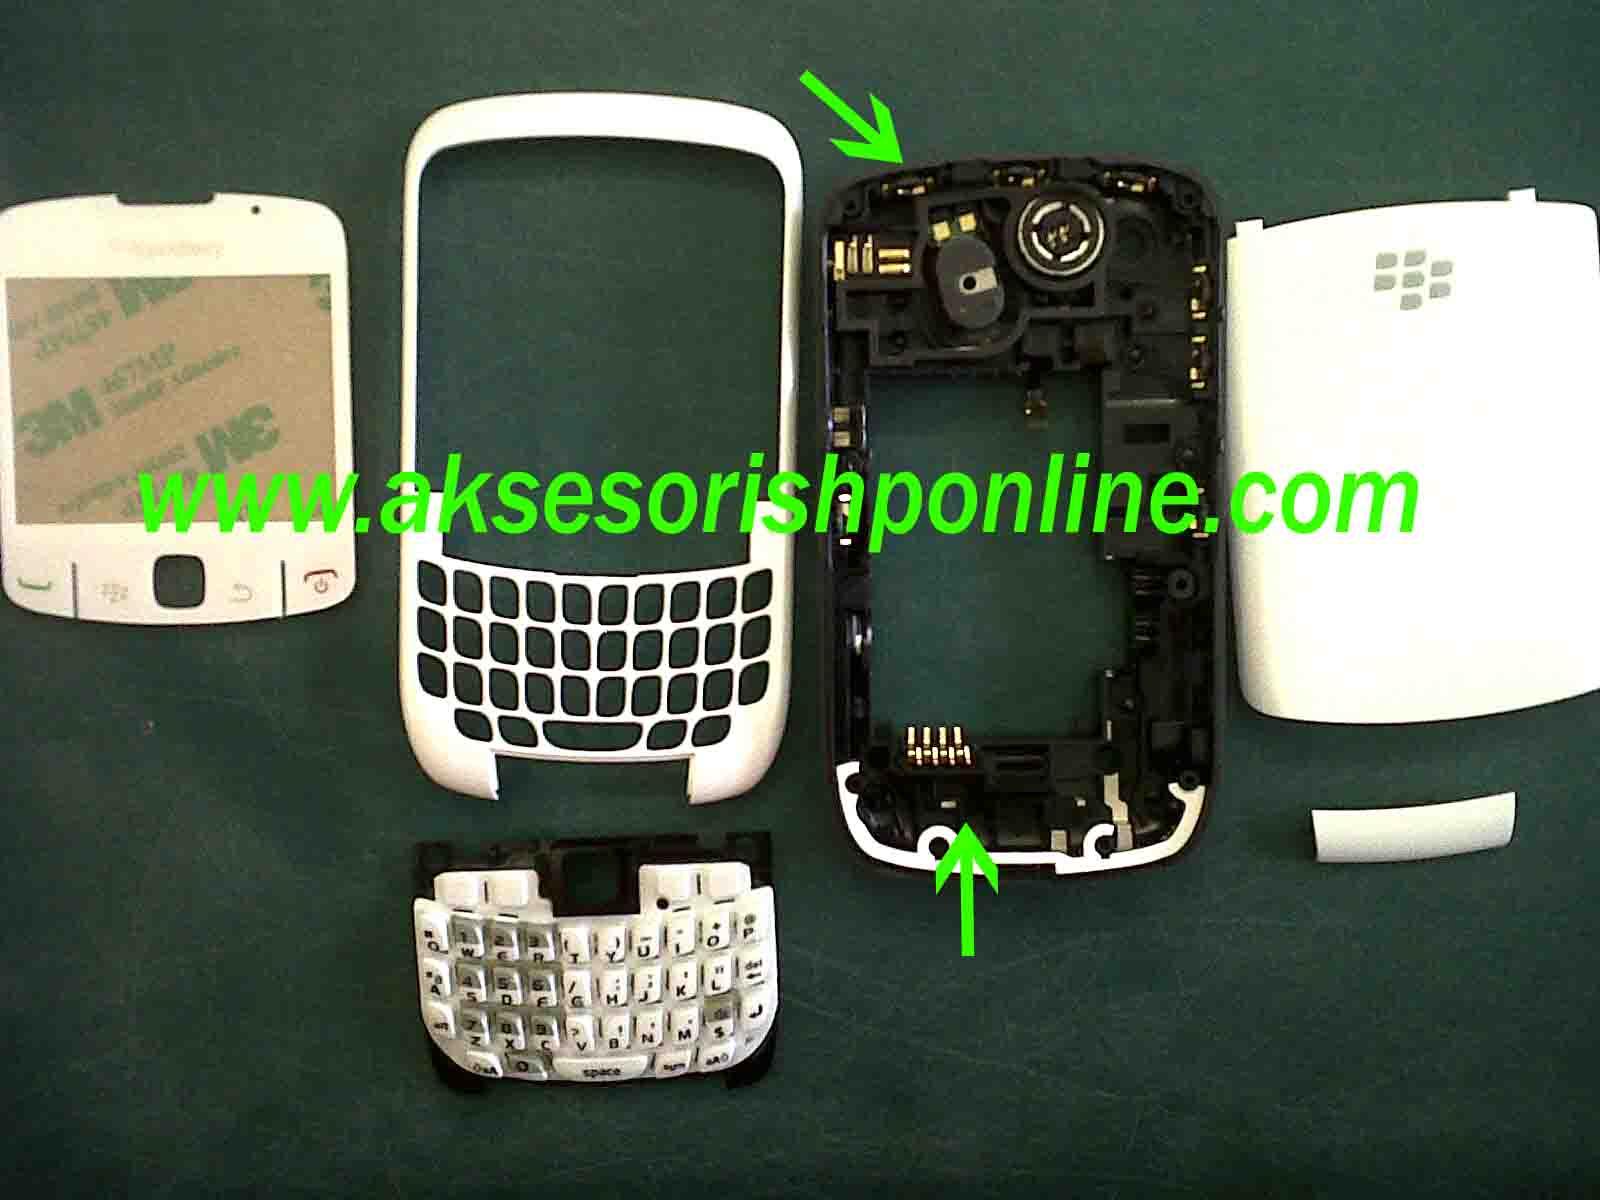 casing fullset blackberry gemini 8520 white pearl edition untuk hp